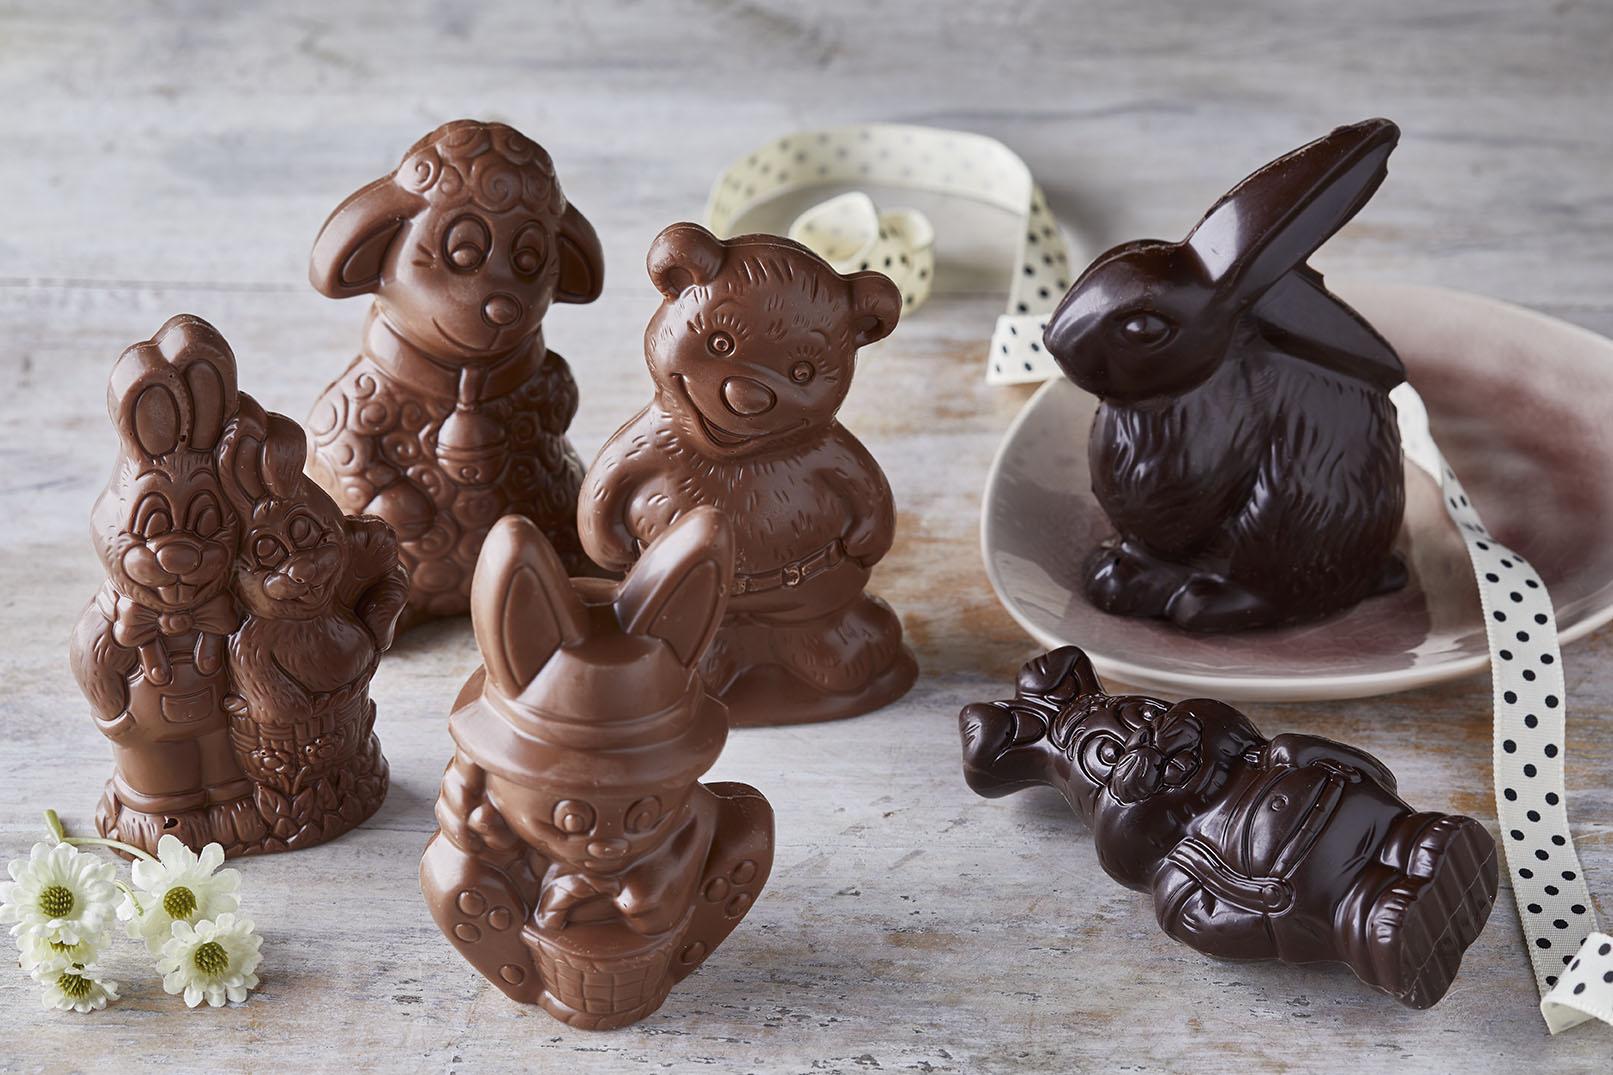 Mini σοκολατένια ζωάκια